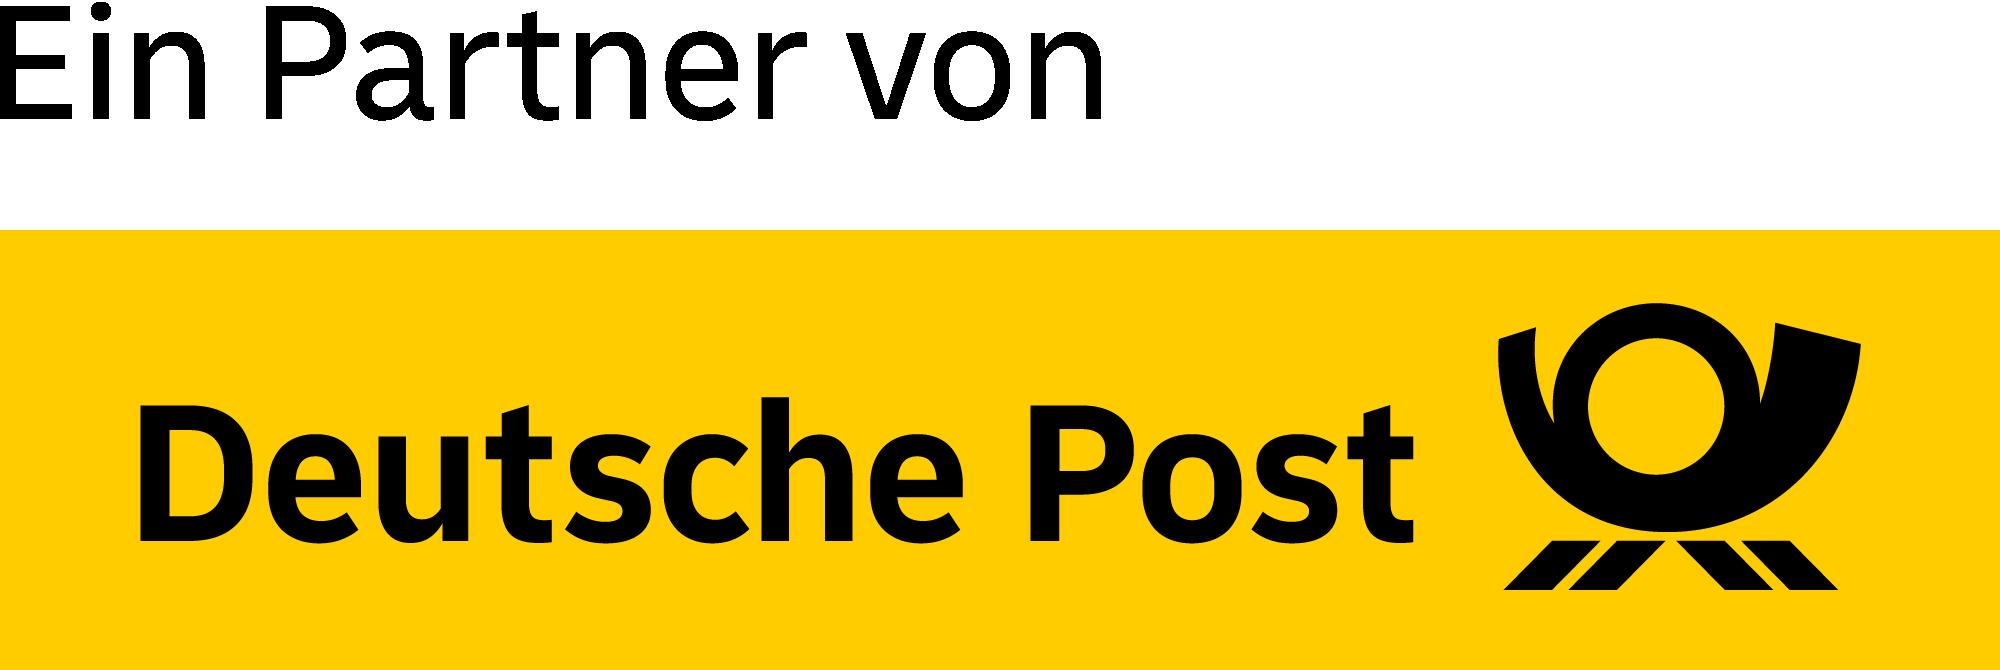 Deutsche Post Partner Logo